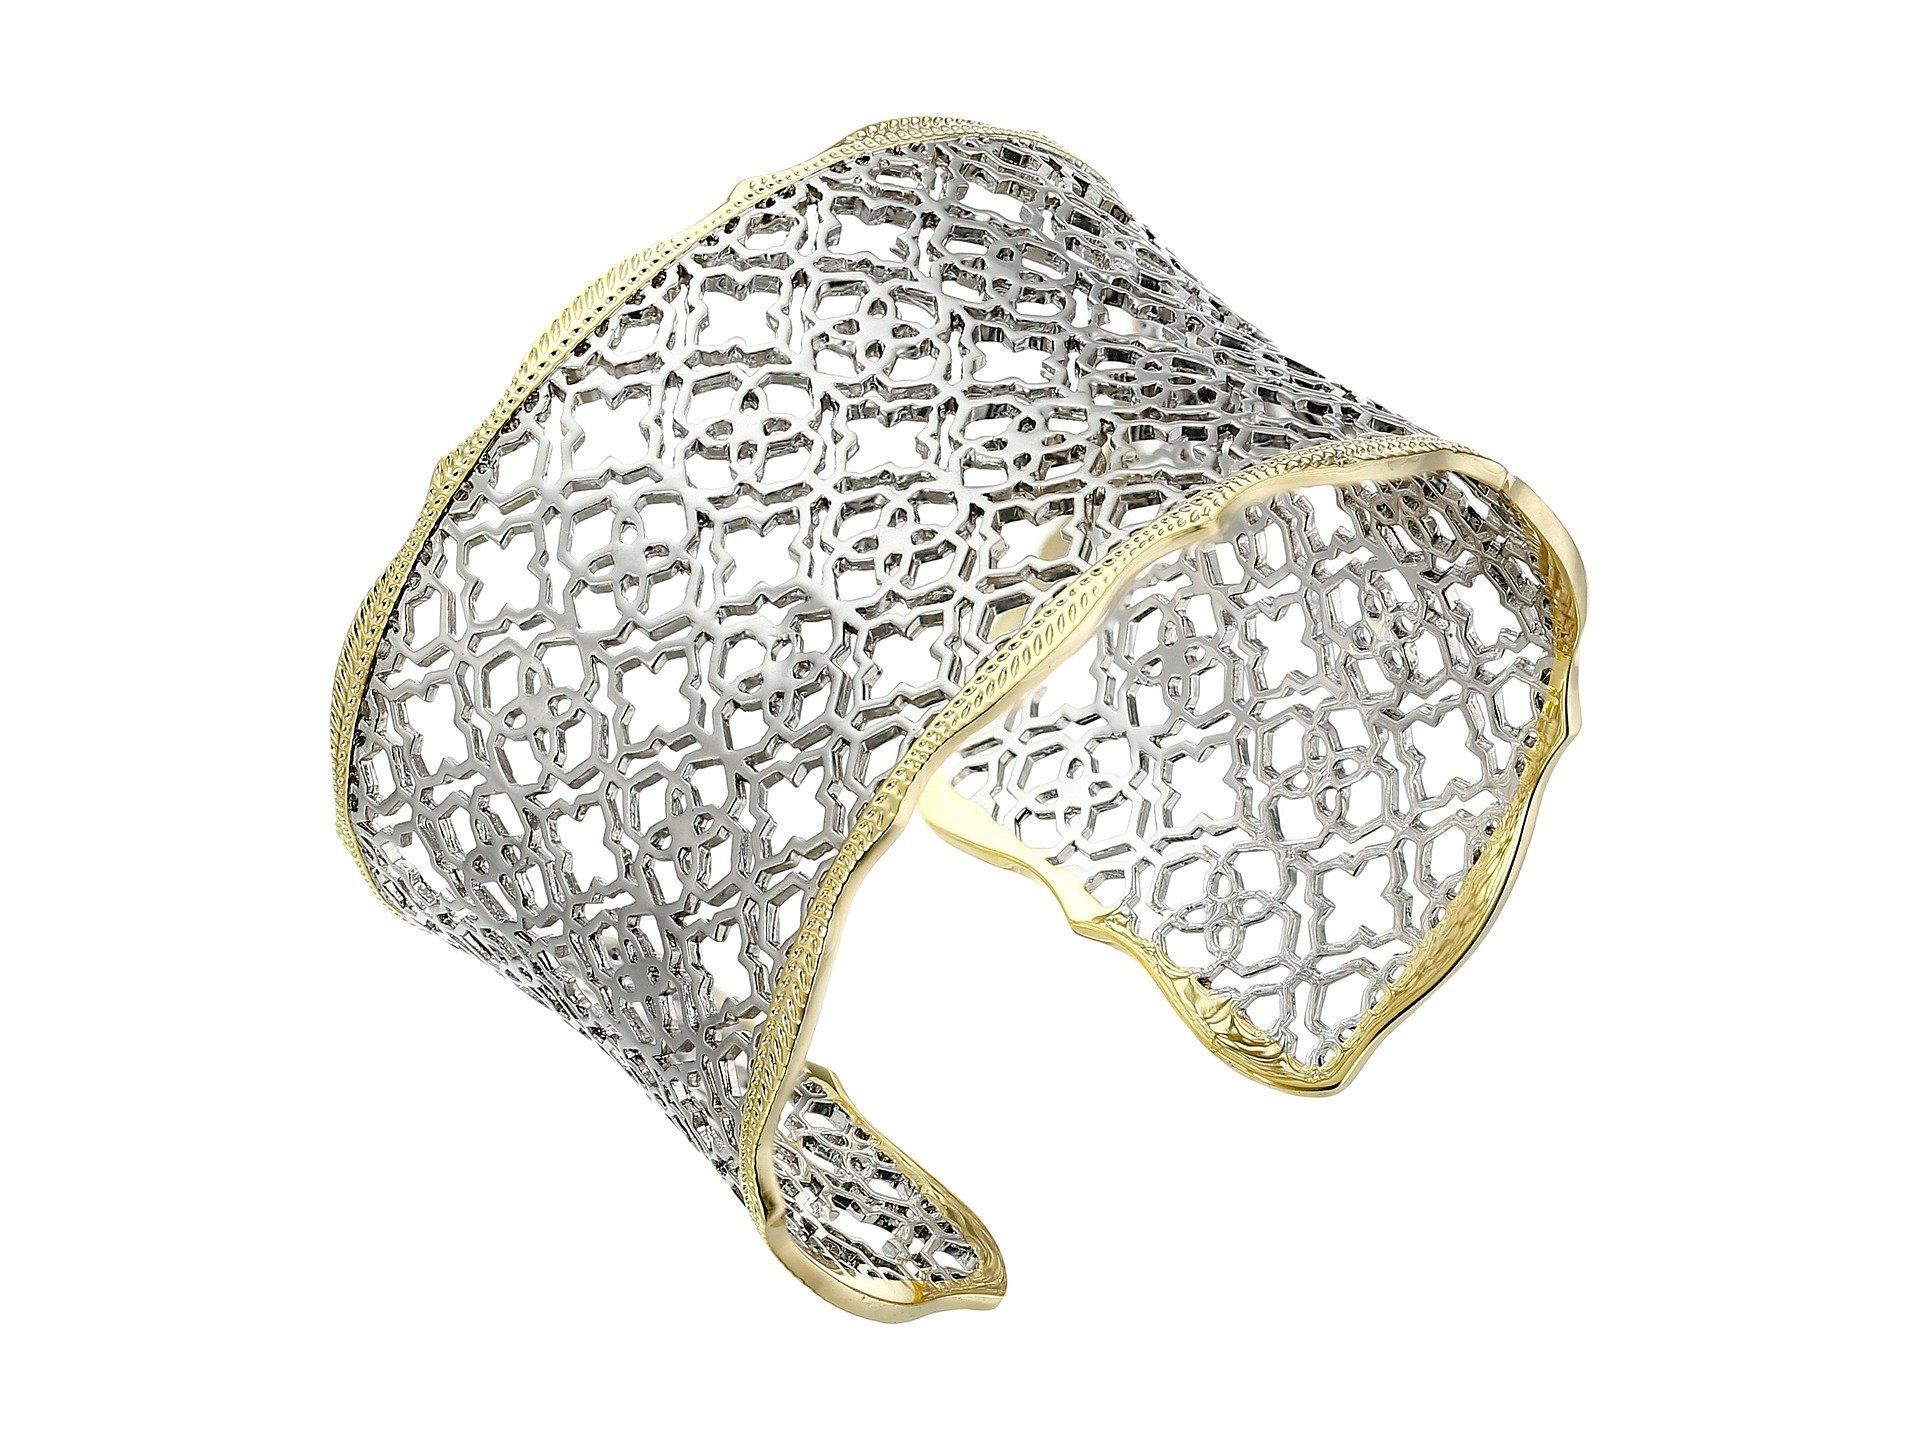 Kendra Scott Women's Candice Bracelet Mixed Gold/Rhodium Bracelet